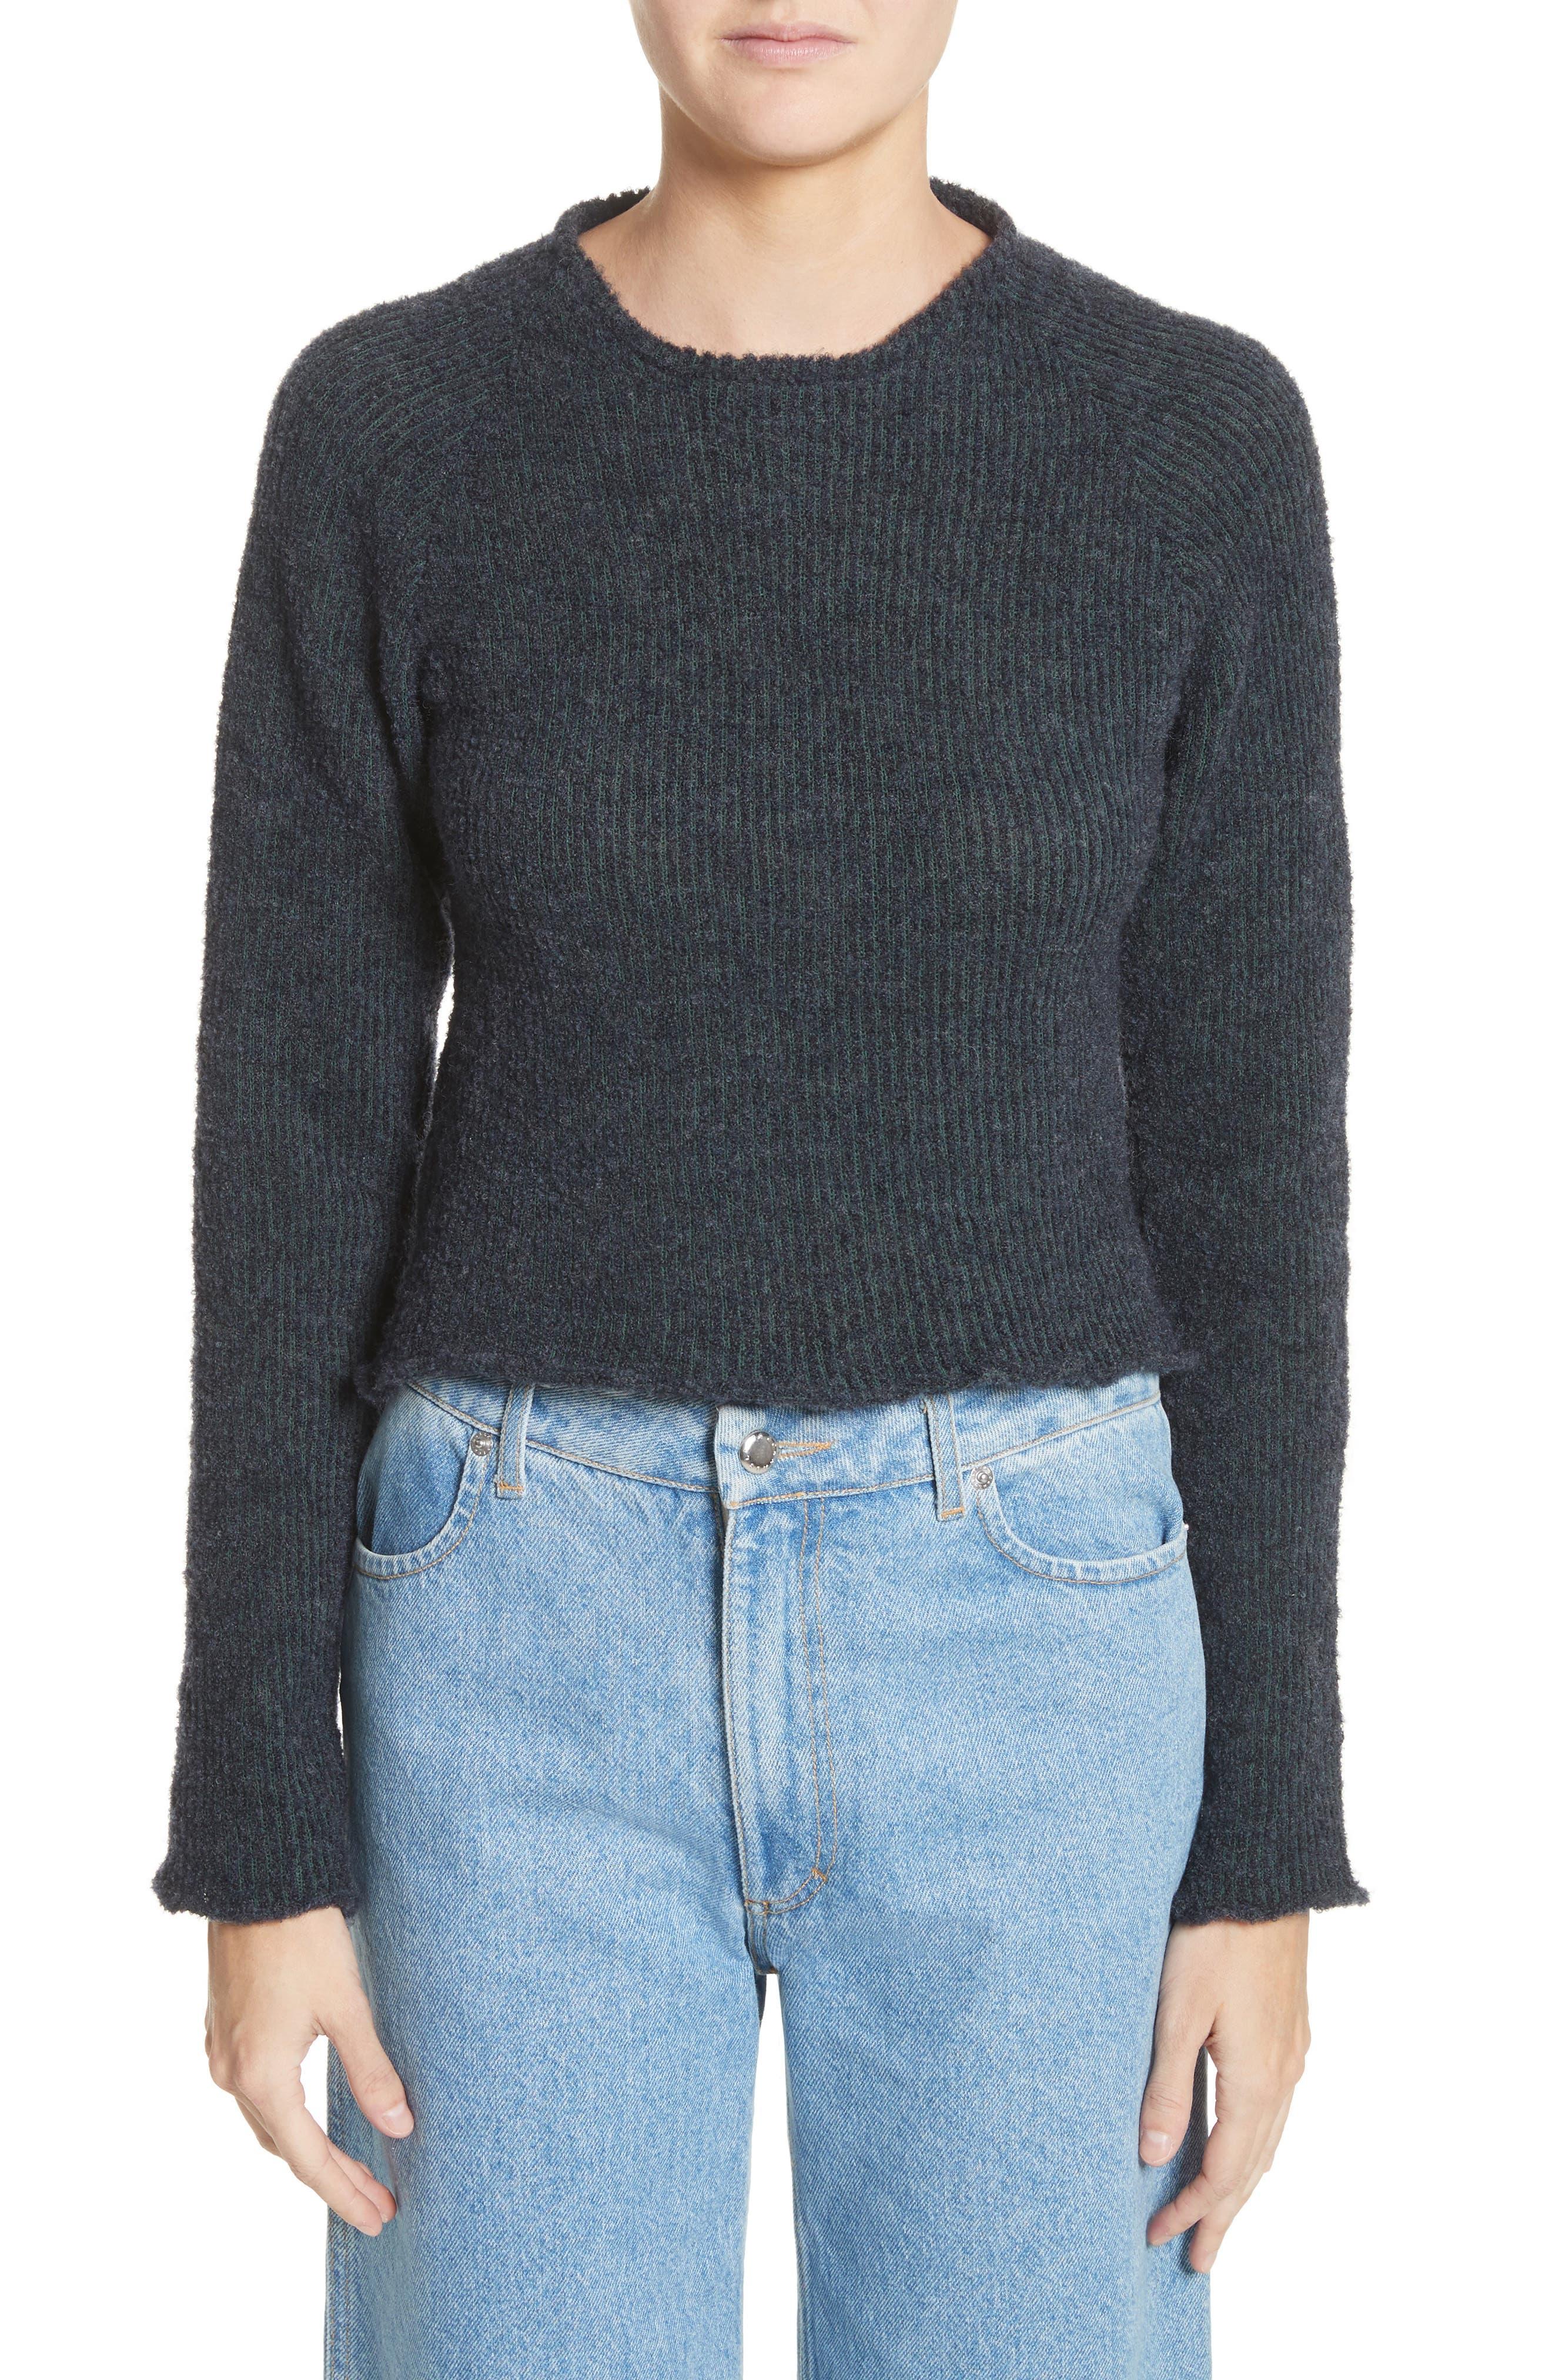 Raglan Pullover Sweater,                             Main thumbnail 1, color,                             NAVY